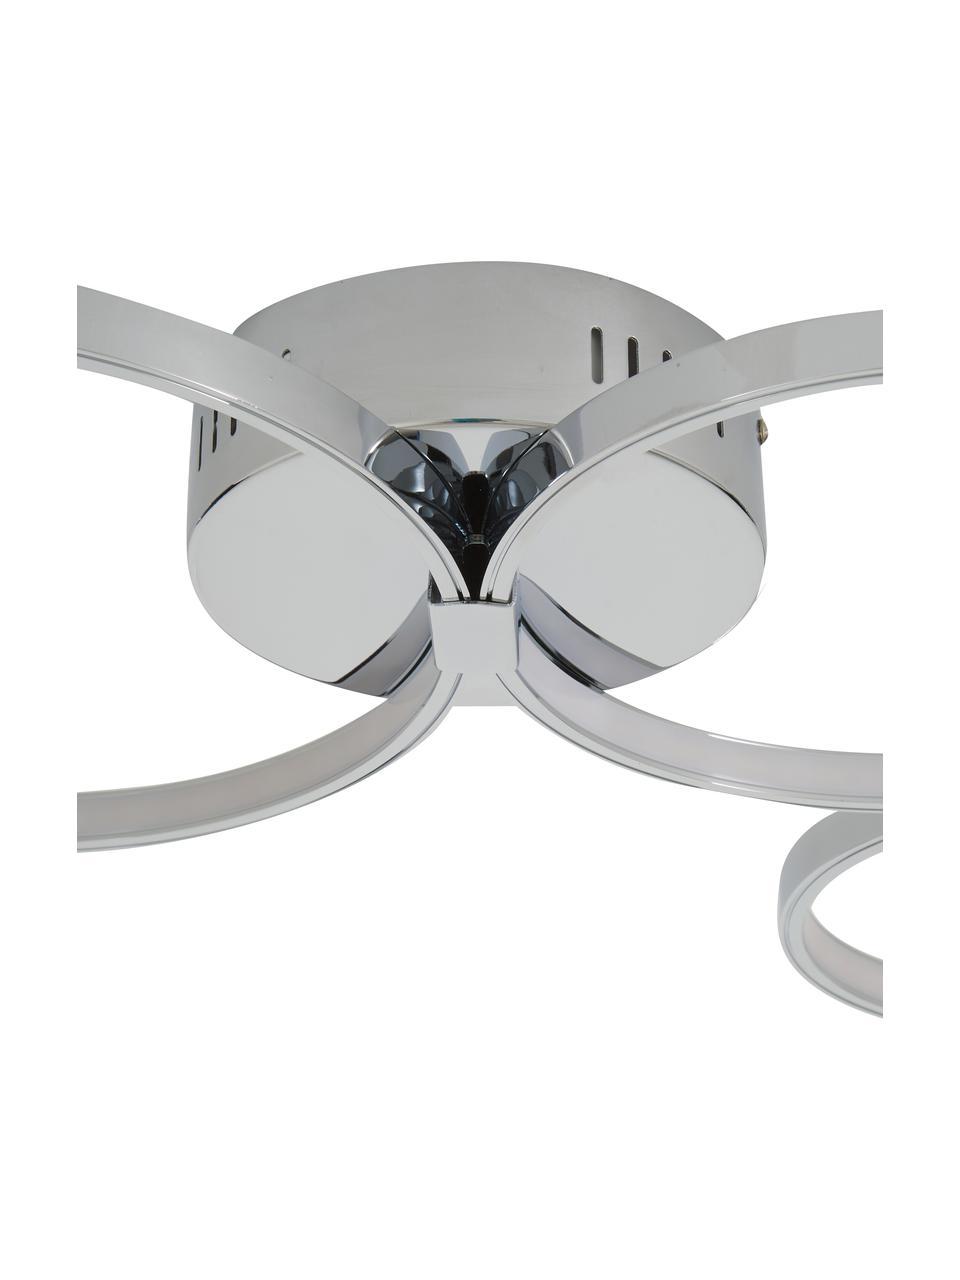 LED-Deckenleuchte Solexa, Baldachin: Metall, verchromt, Chrom, 75 x 7 cm